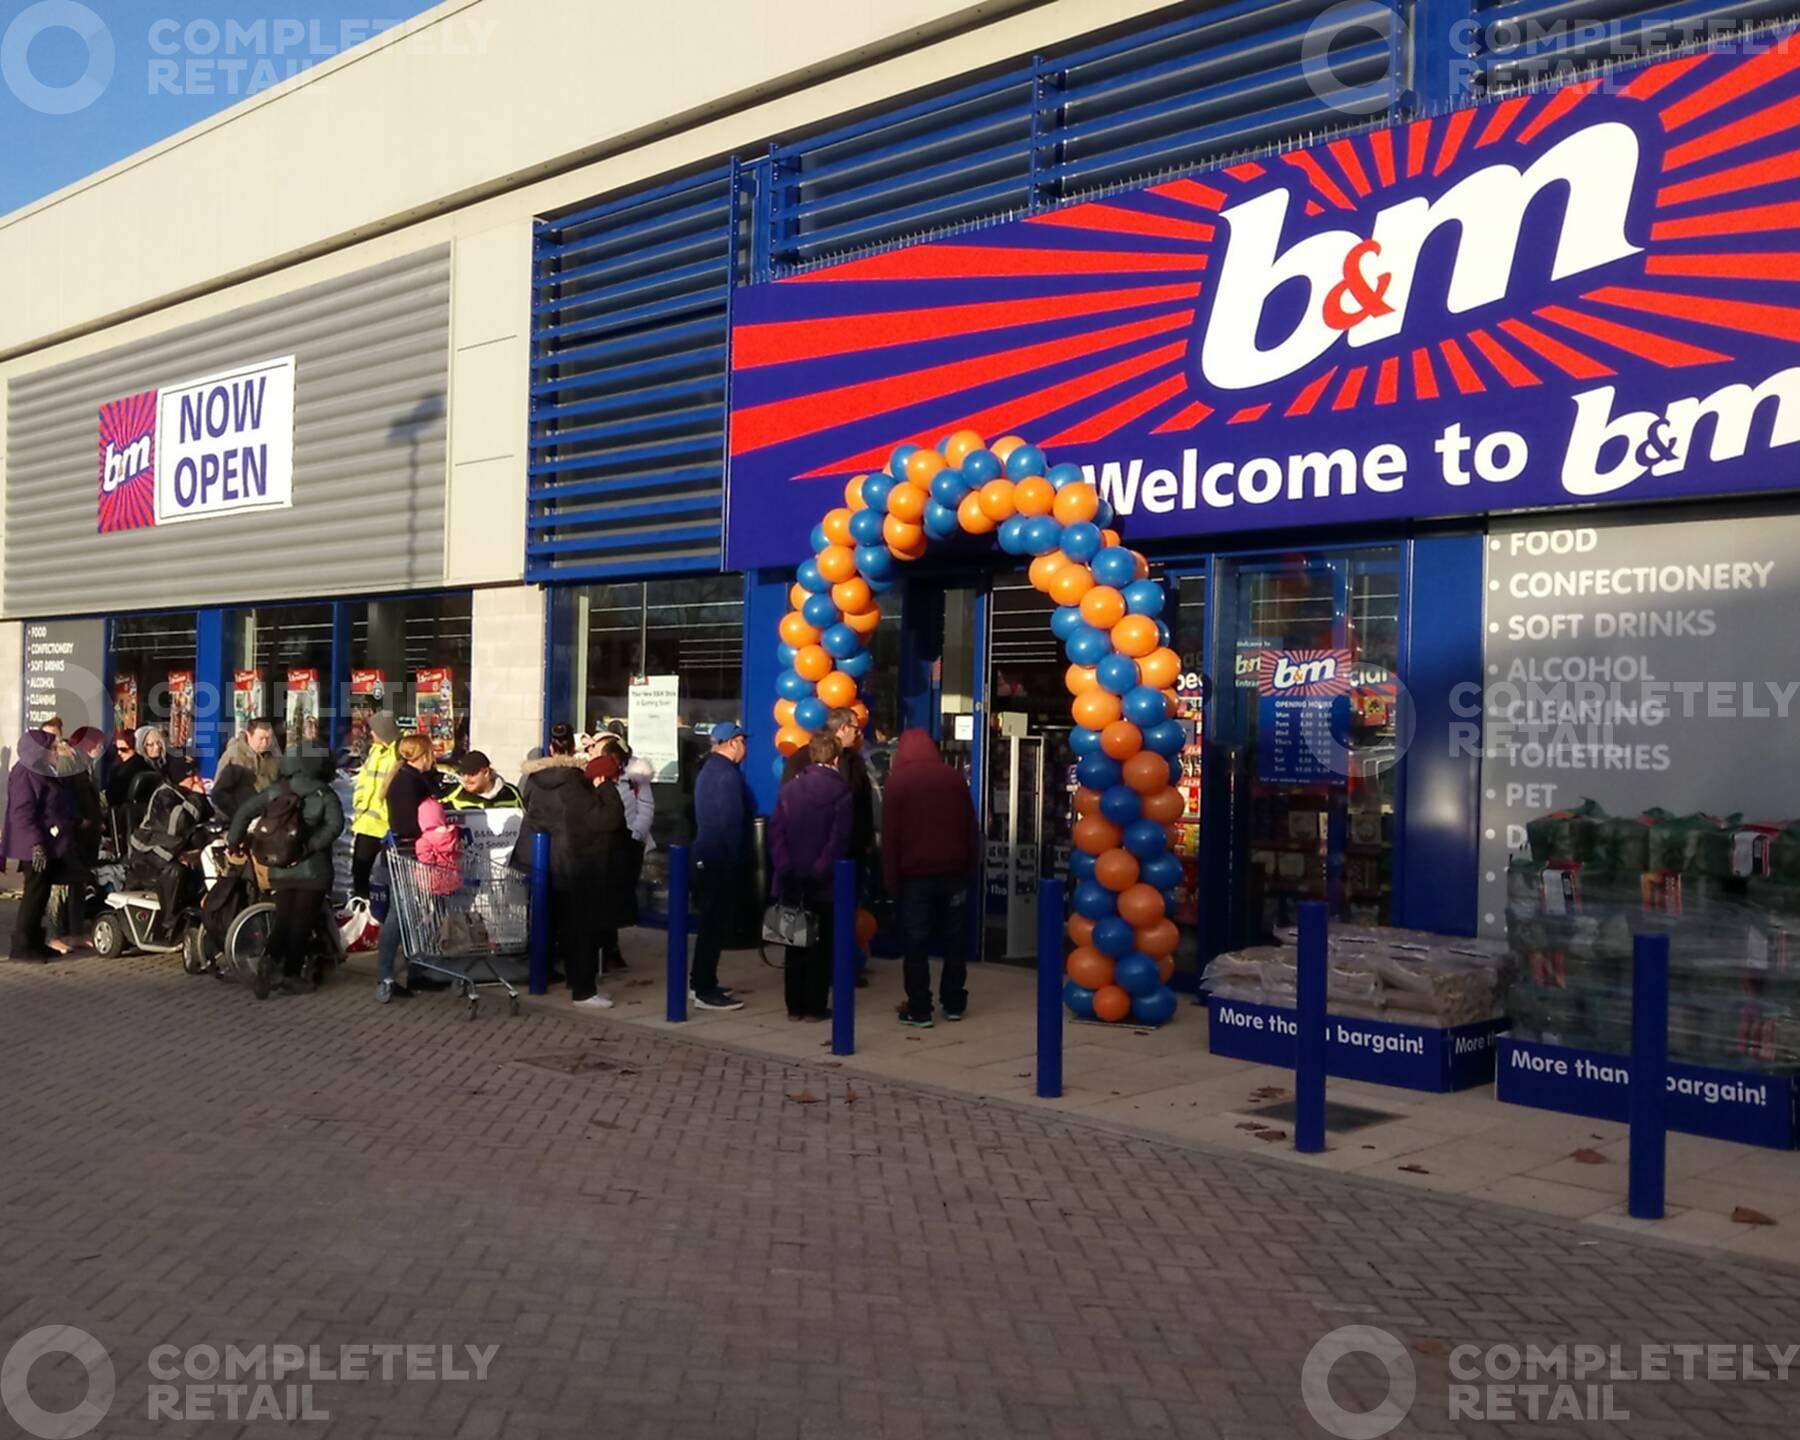 Ortongate Shopping Centre